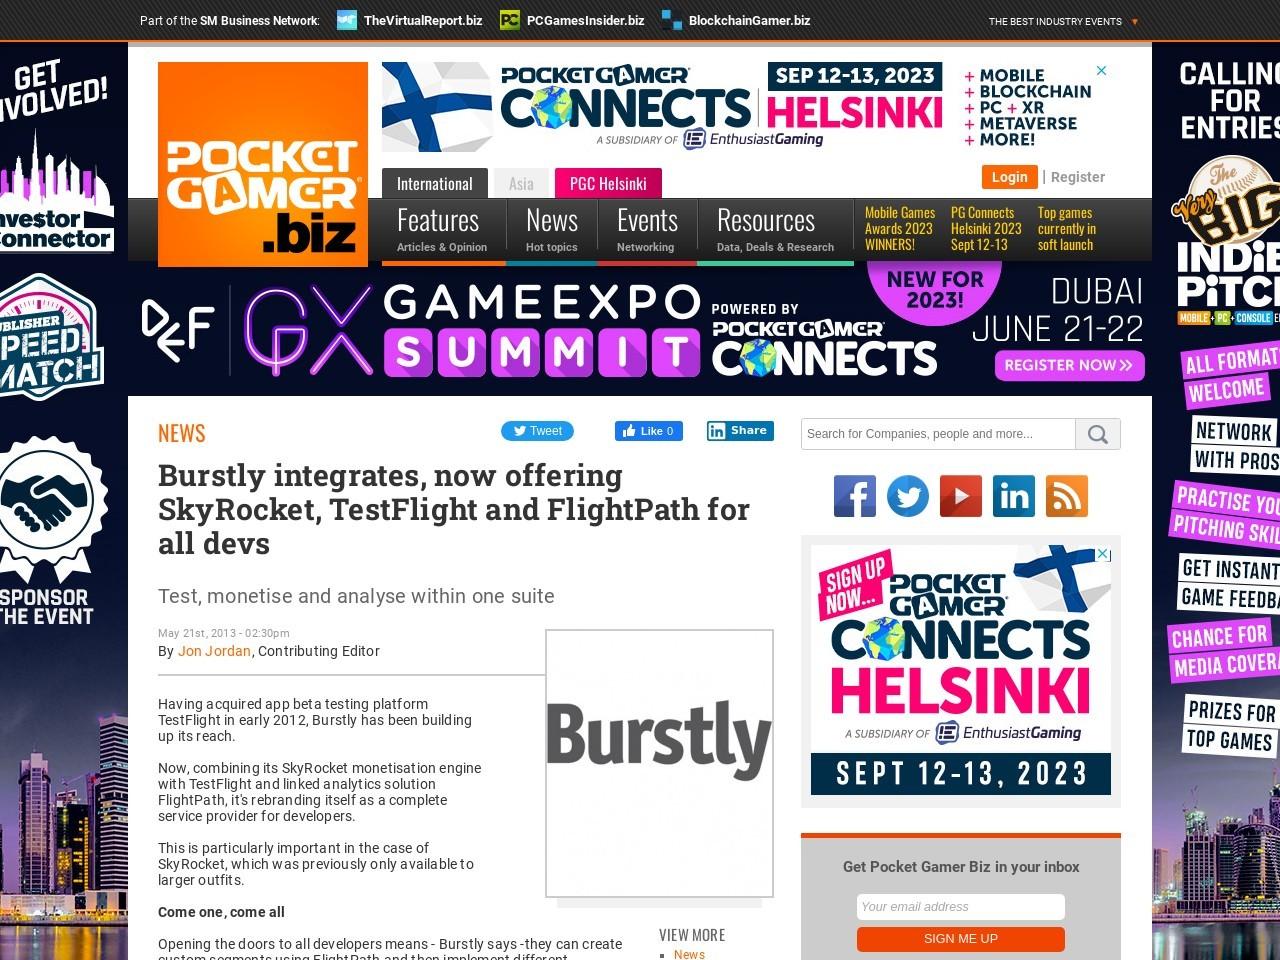 Burstly integrates, now offering SkyRocket, TestFlight and FlightPath for all devs